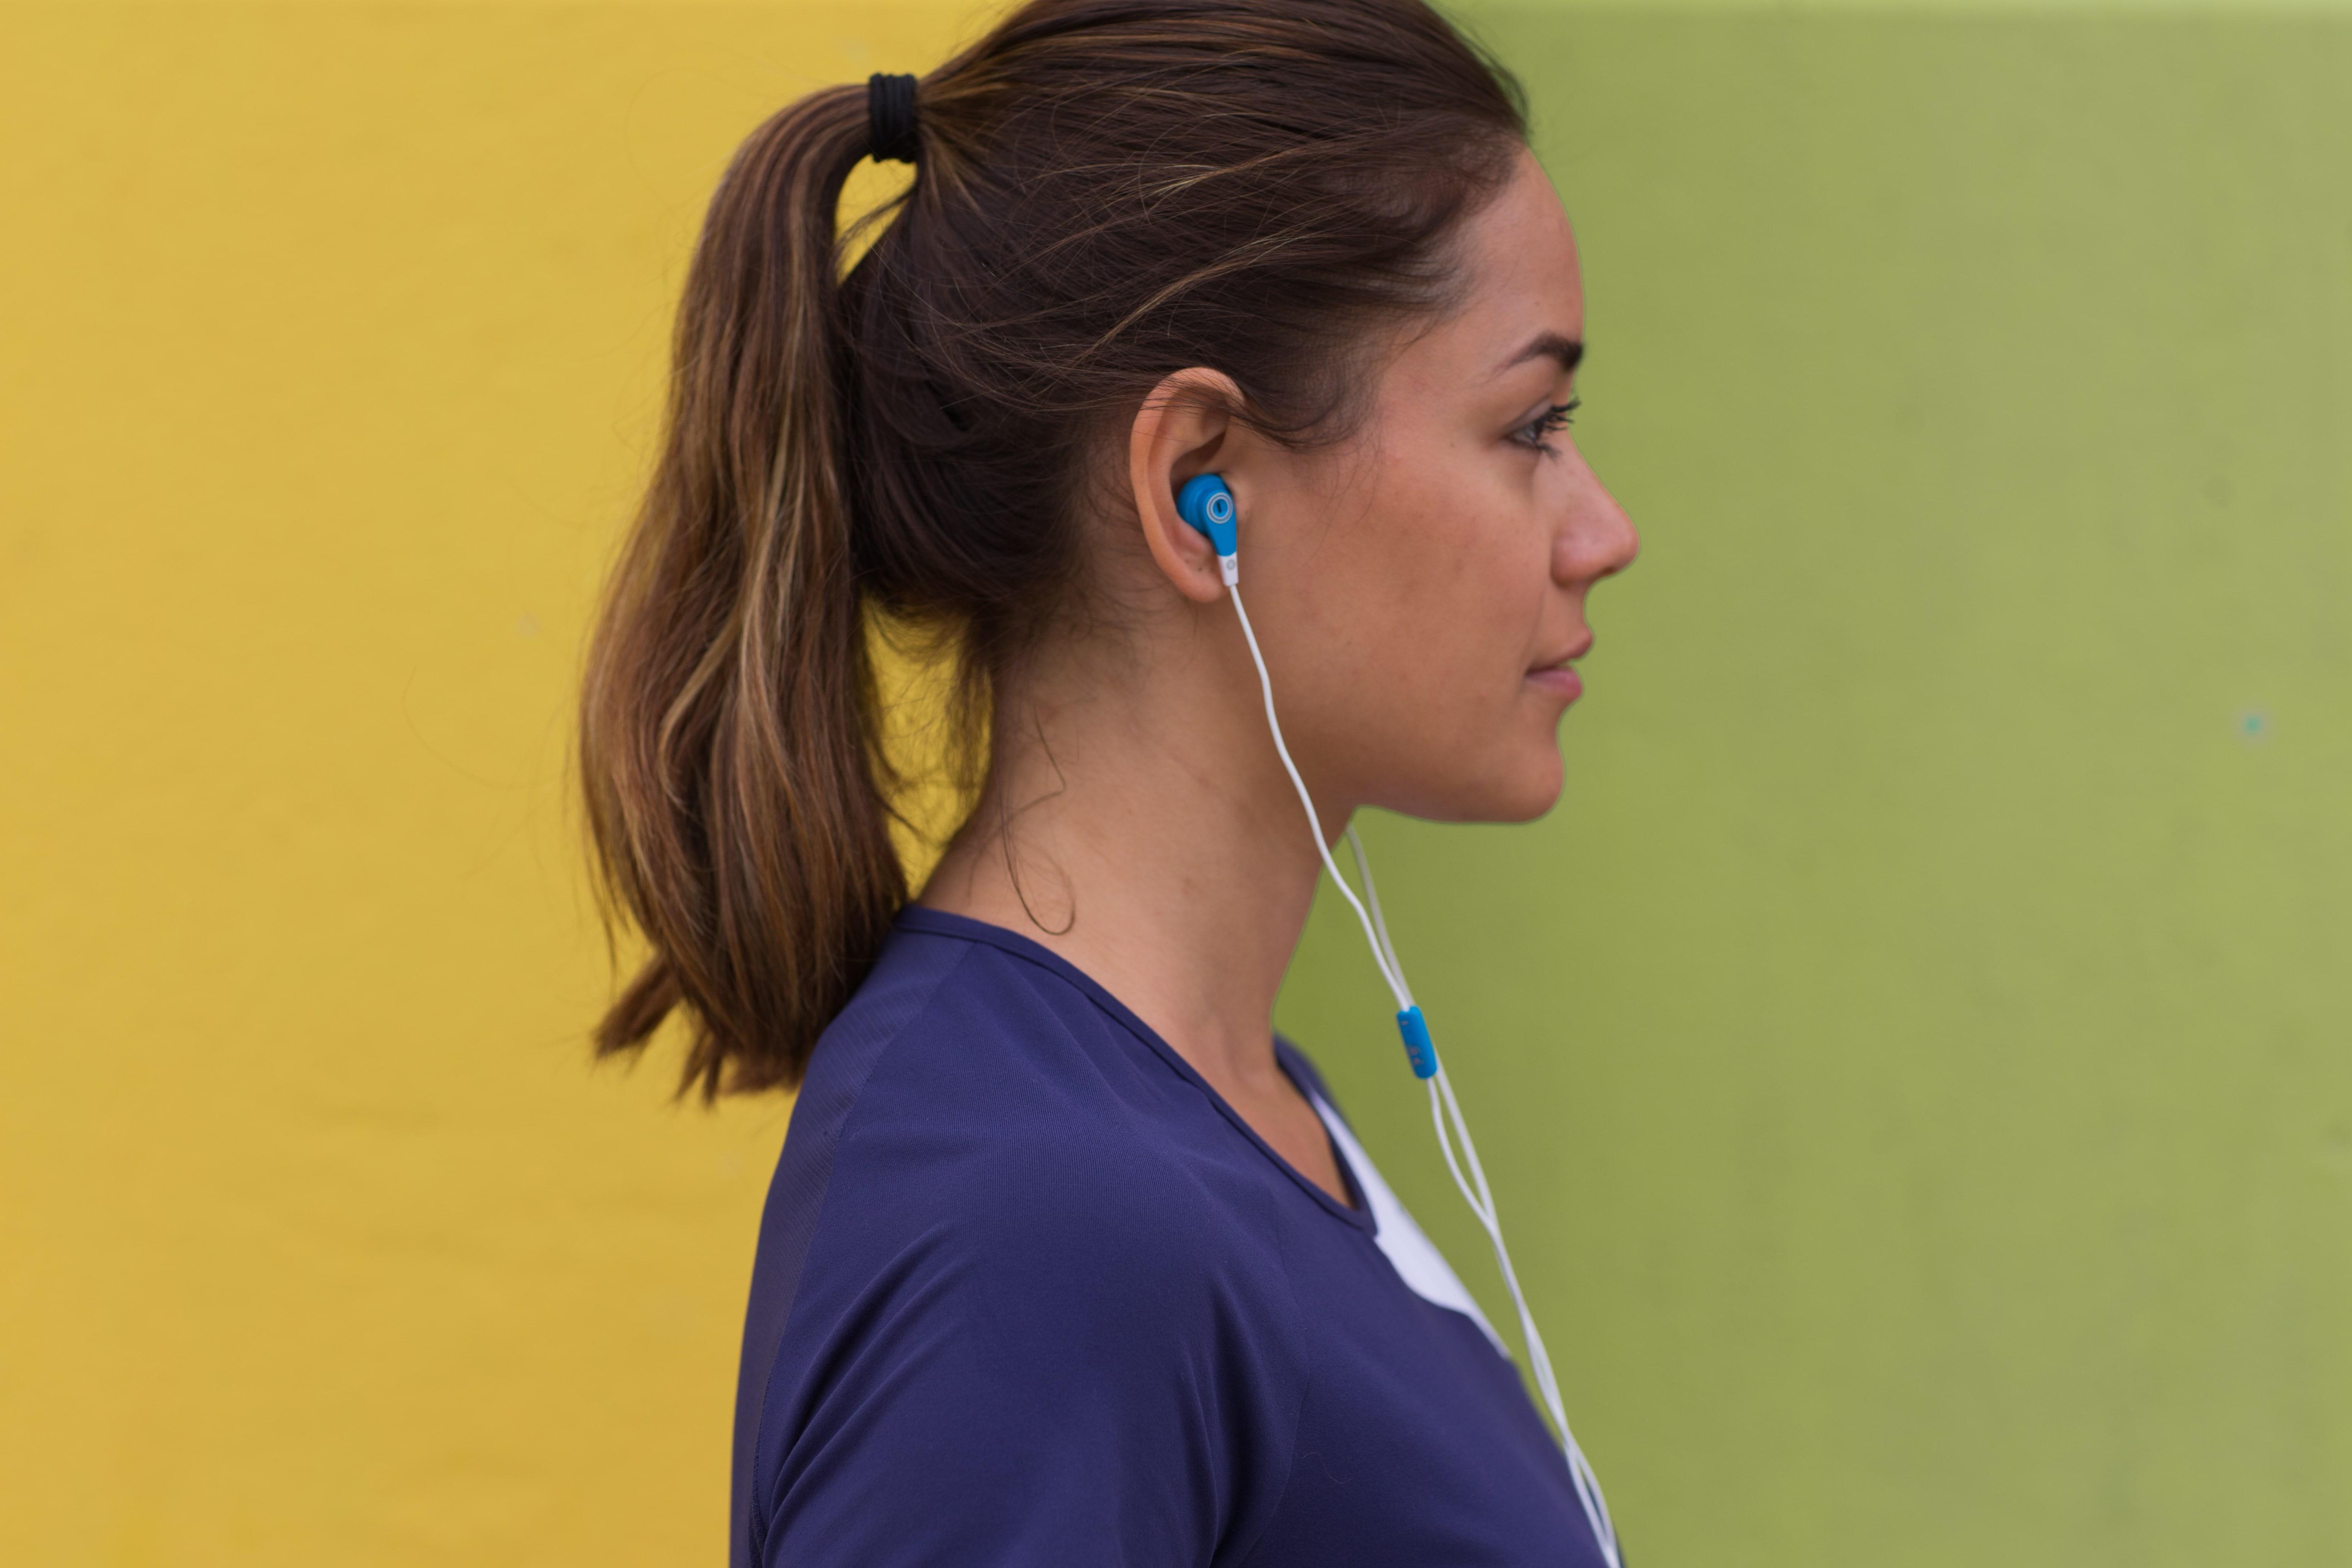 Quaran-tunes or Workout Playlist? - Decathletes Choose!